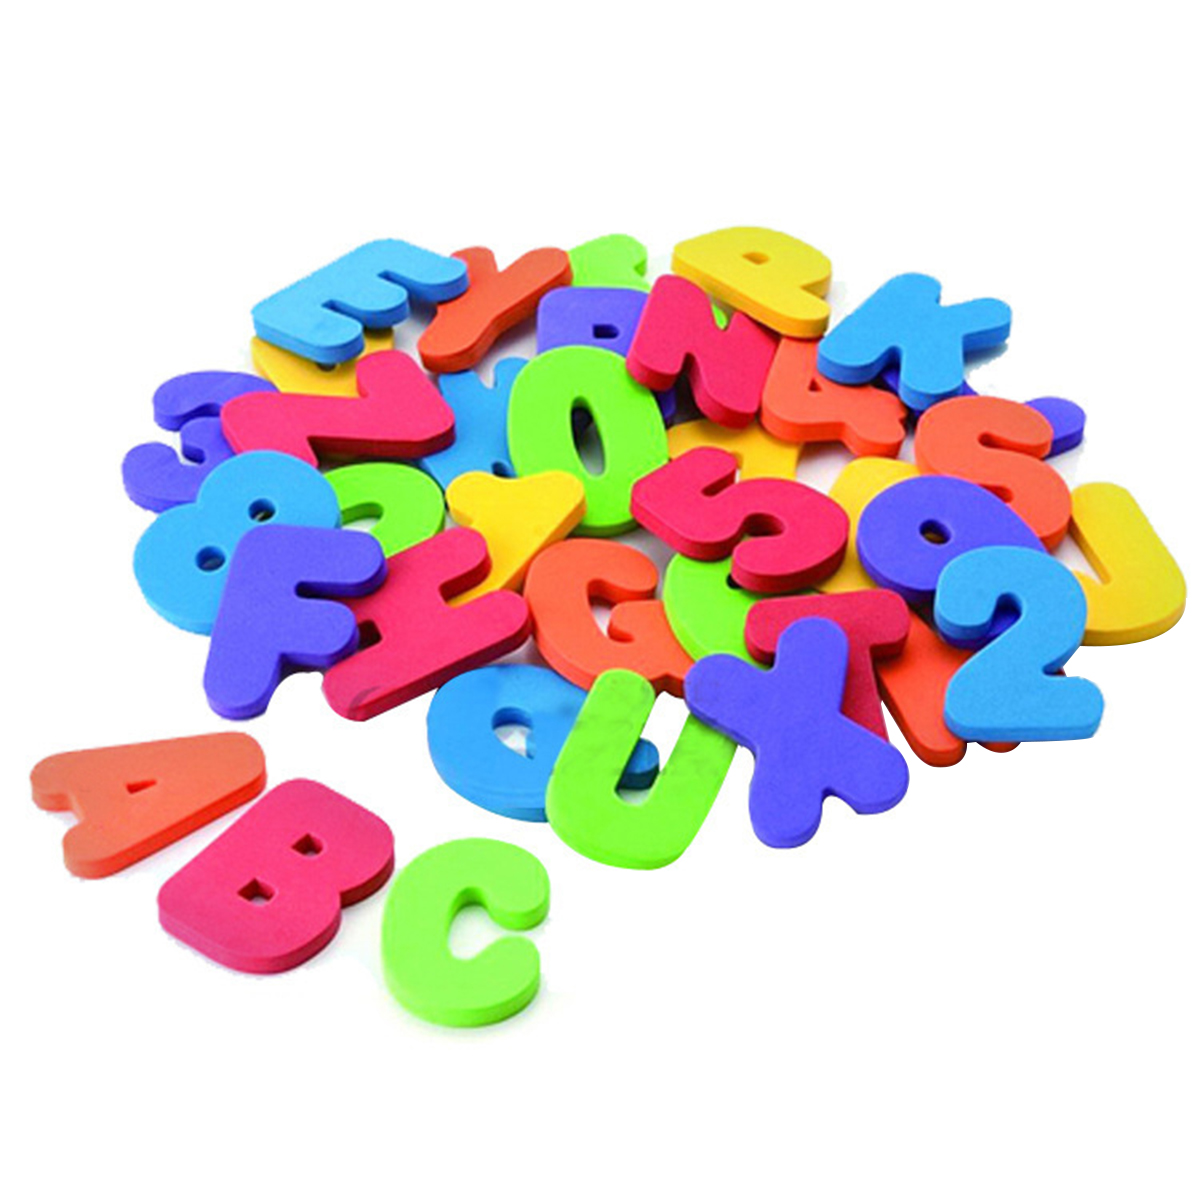 36Pcs Baby Bath Toy Set Outgeek Creative Foam Letters